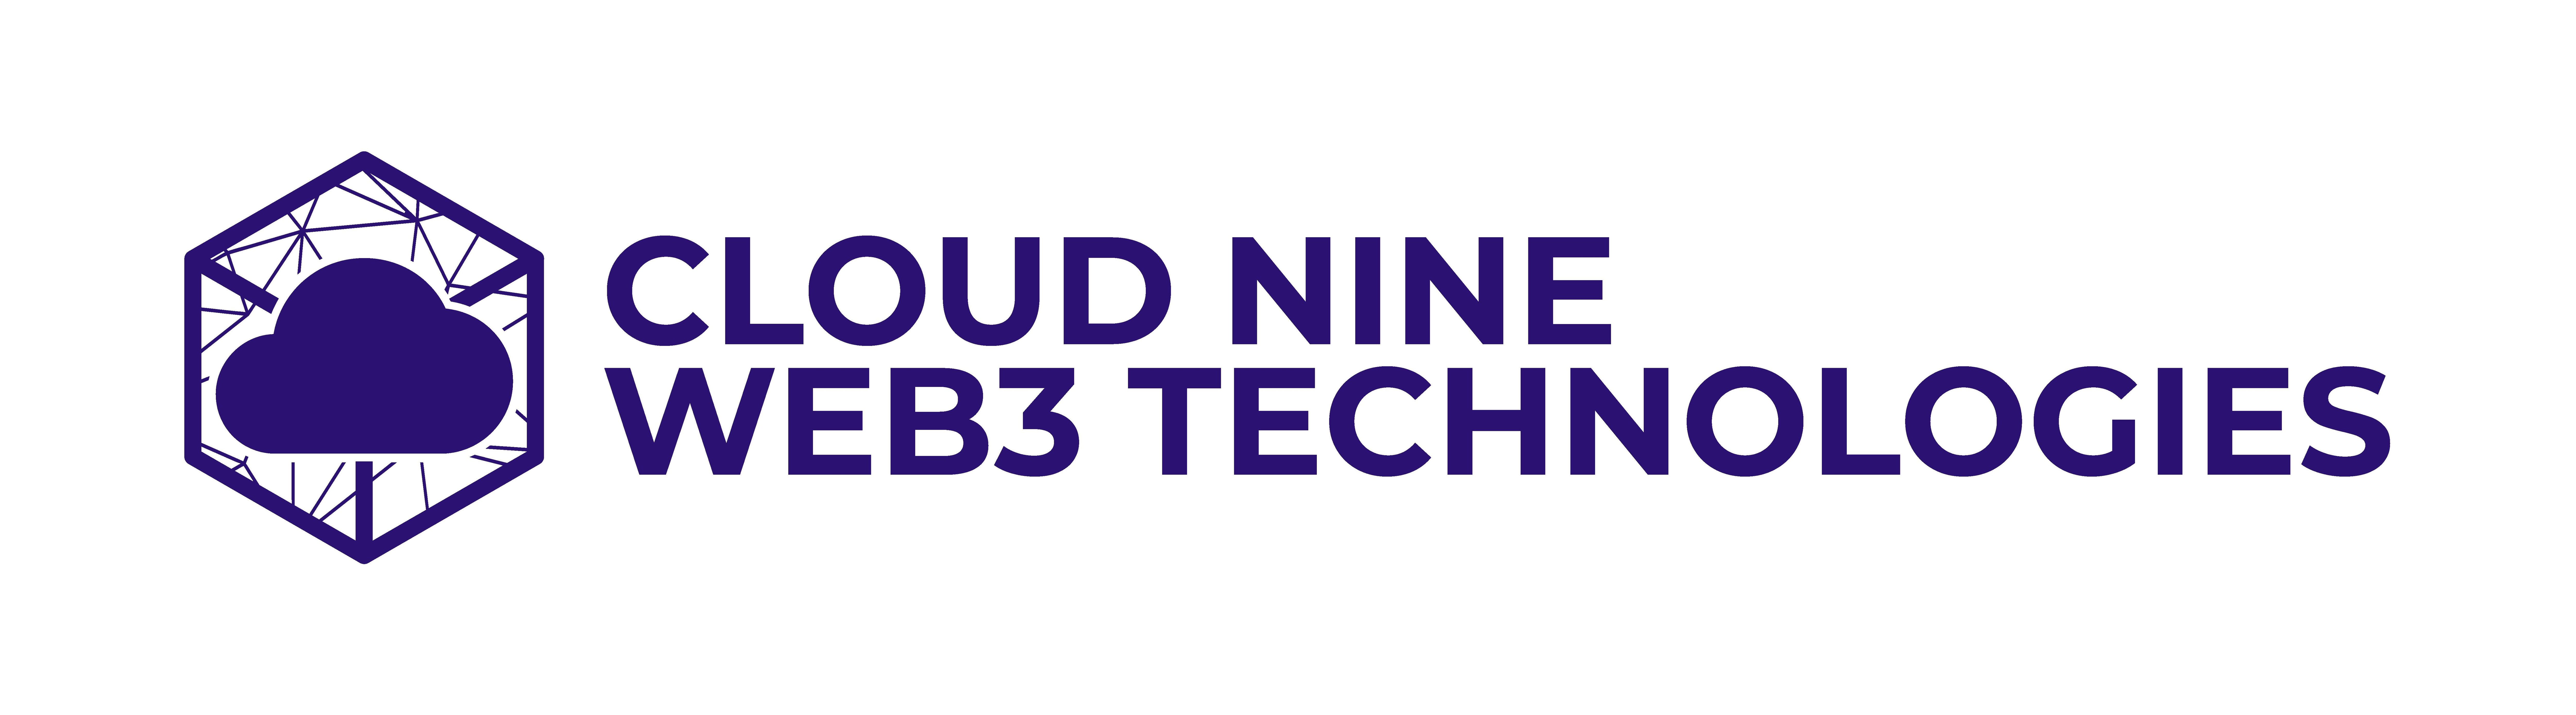 Cloud Nine Adds Entrepreneur Sefton Fincham as President